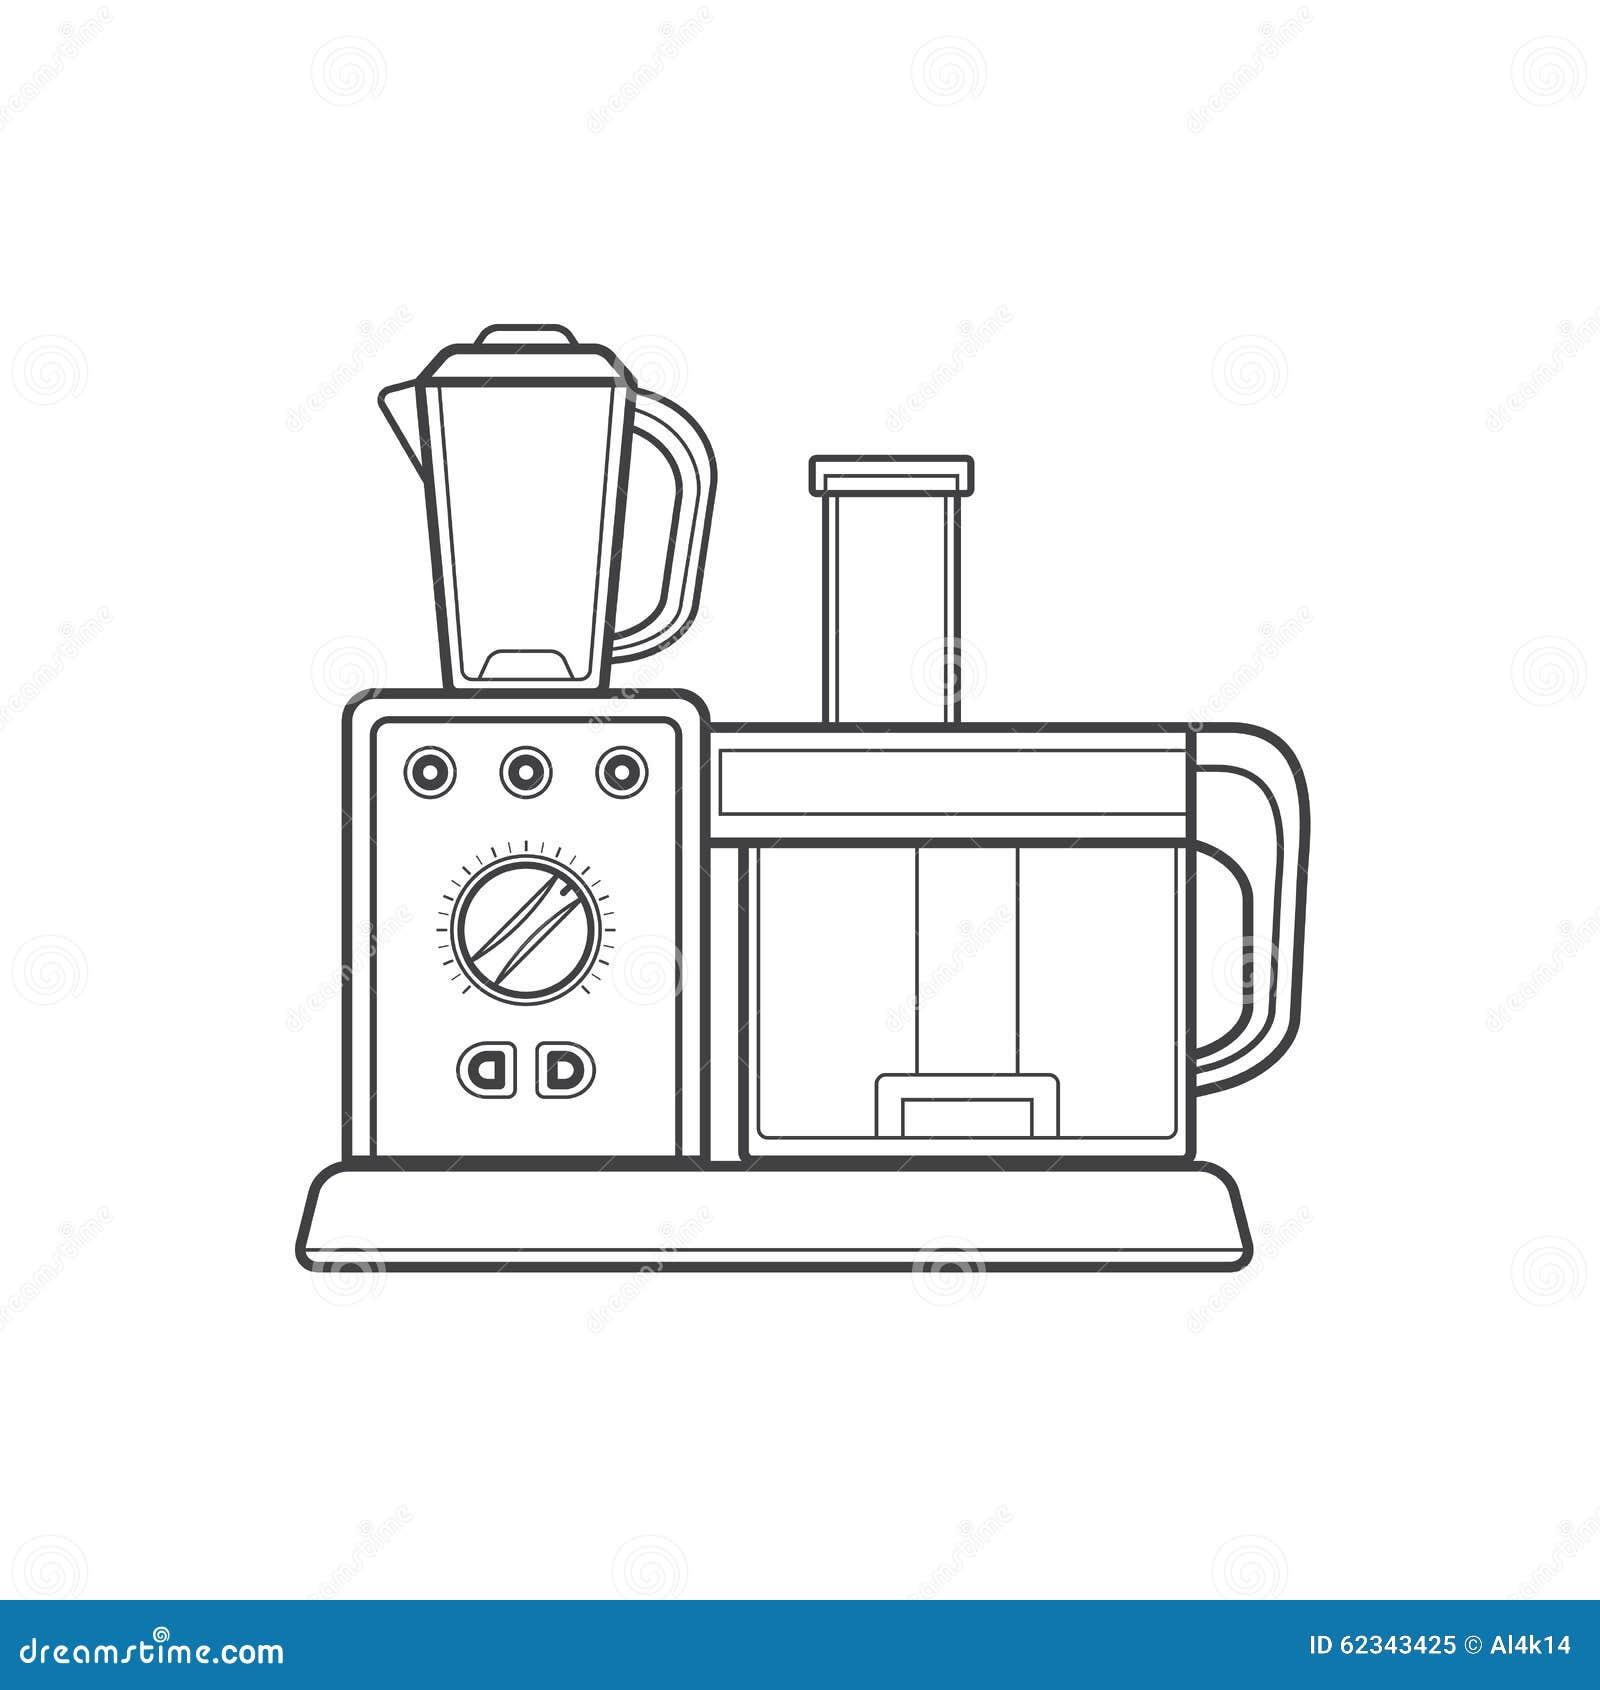 Electric Mixer Outline ~ Outline kitchen food processor illustration stock photo